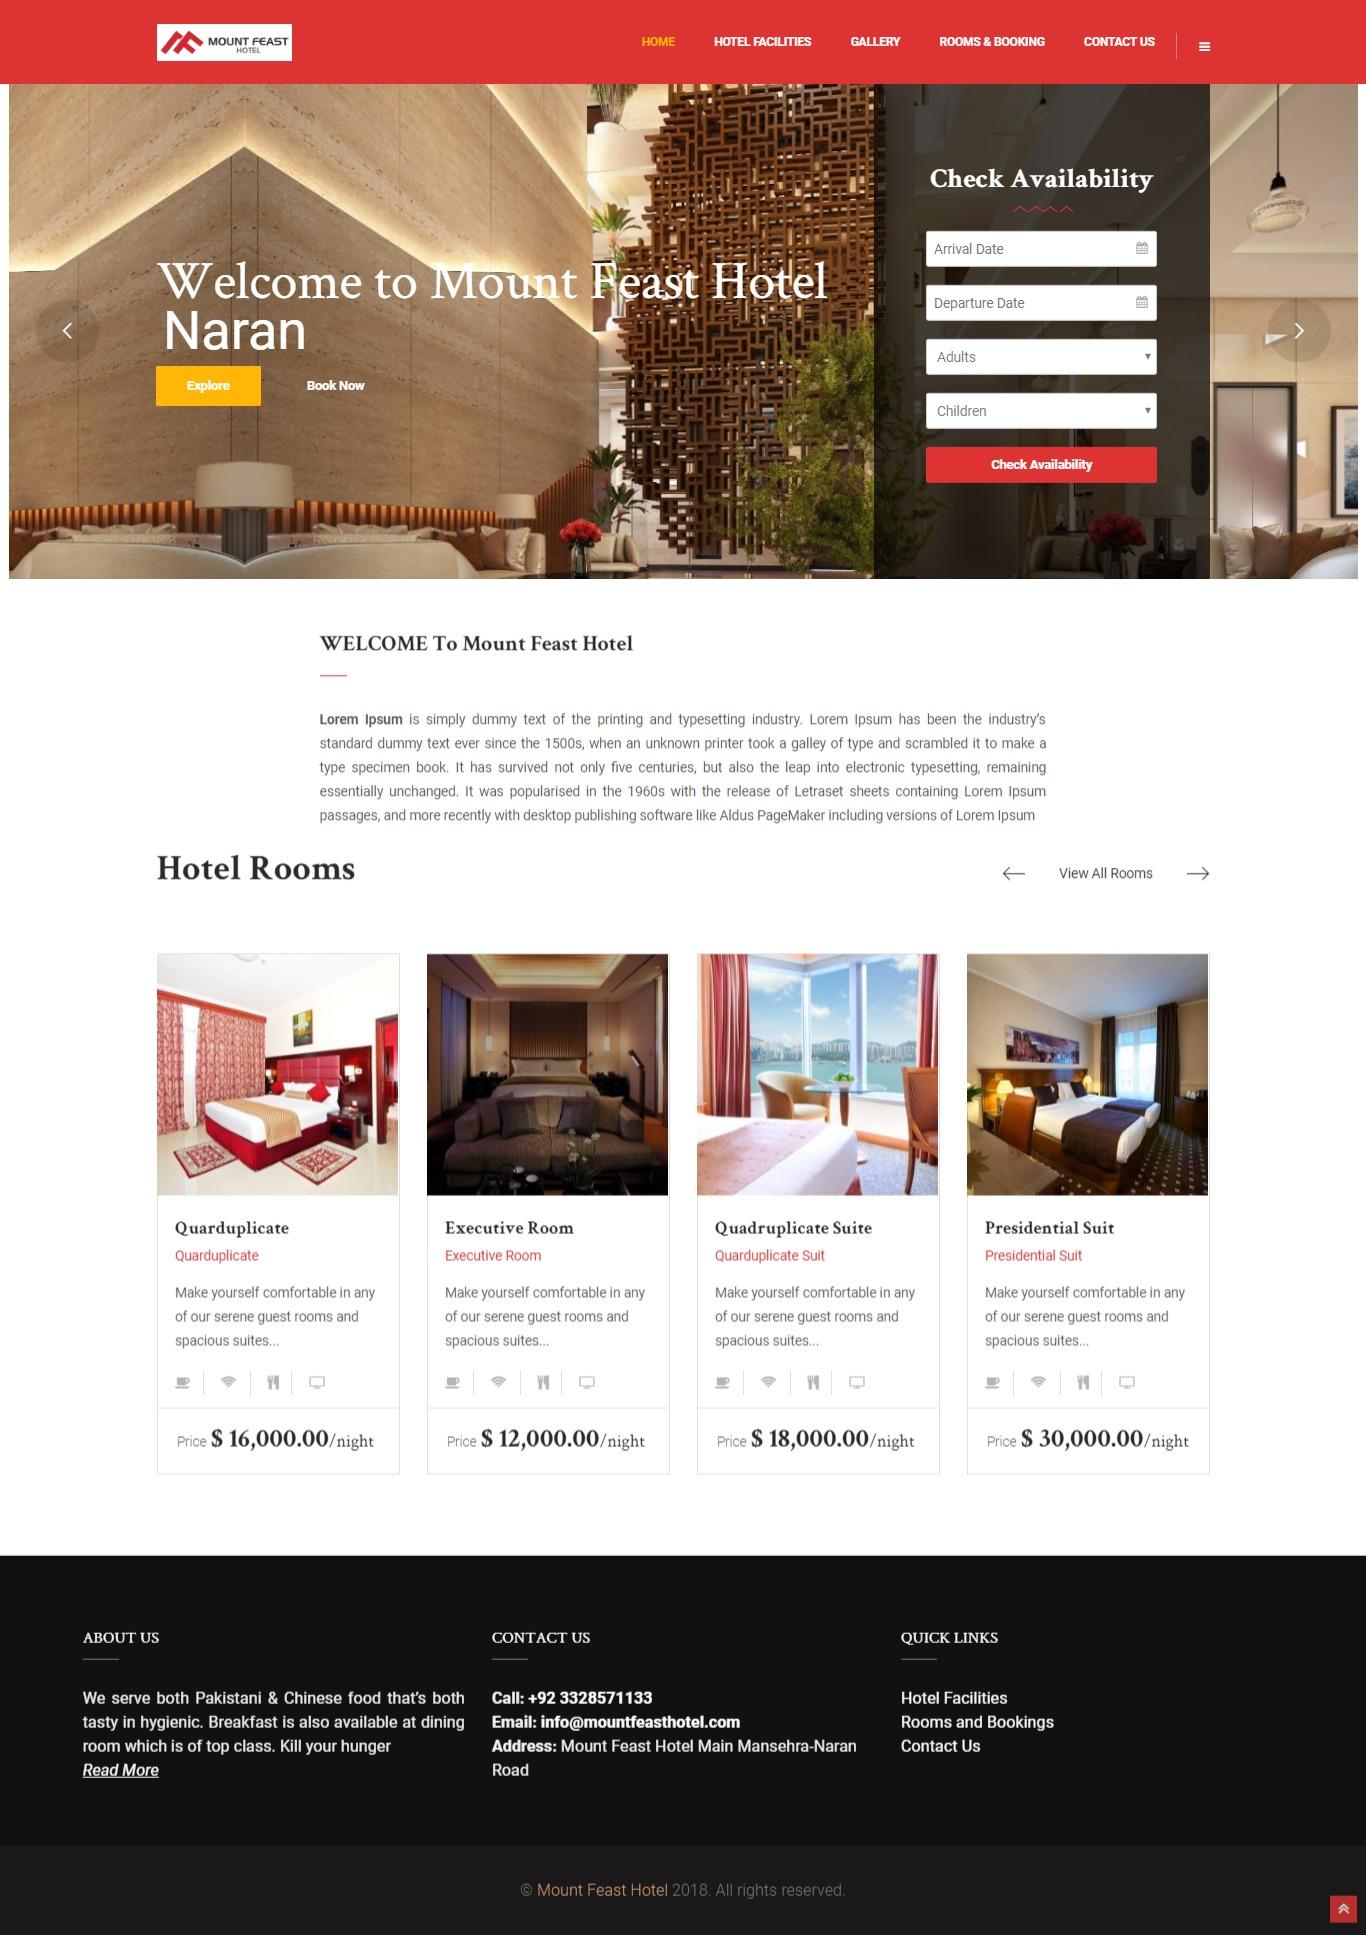 mountfeasthotel.com